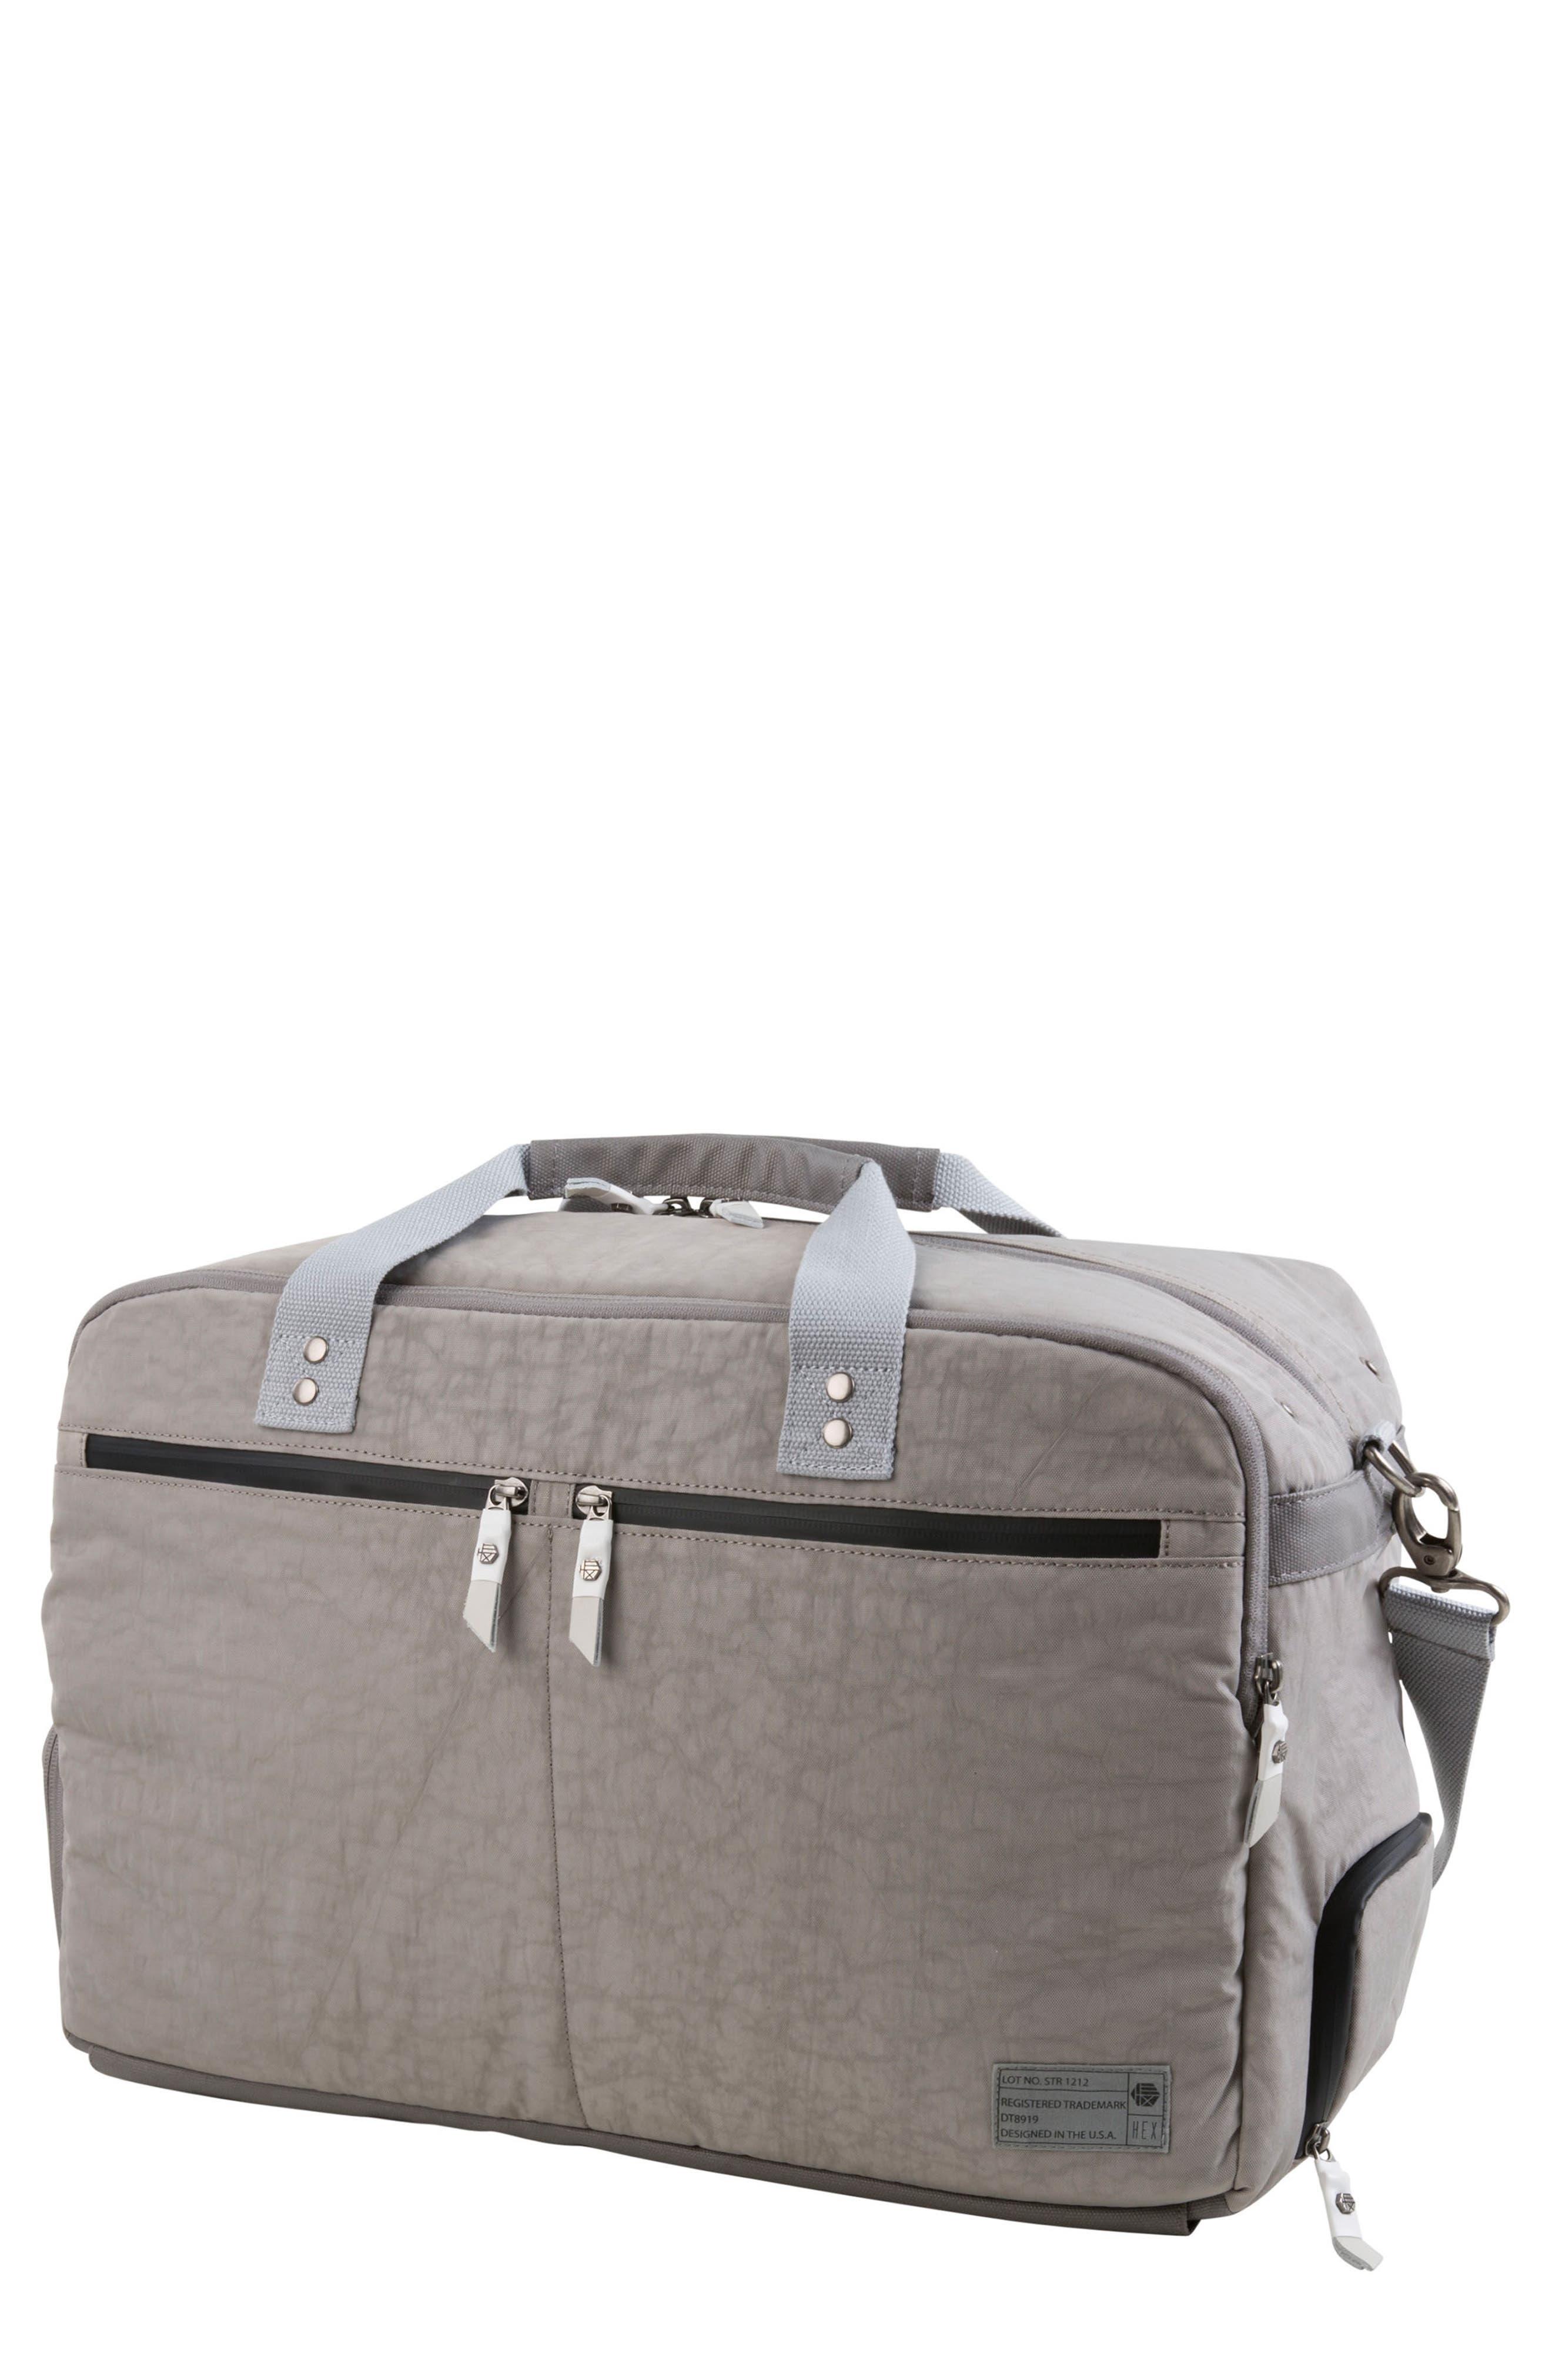 Calibre Convertible Duffel Bag,                             Main thumbnail 1, color,                             Strata Grey